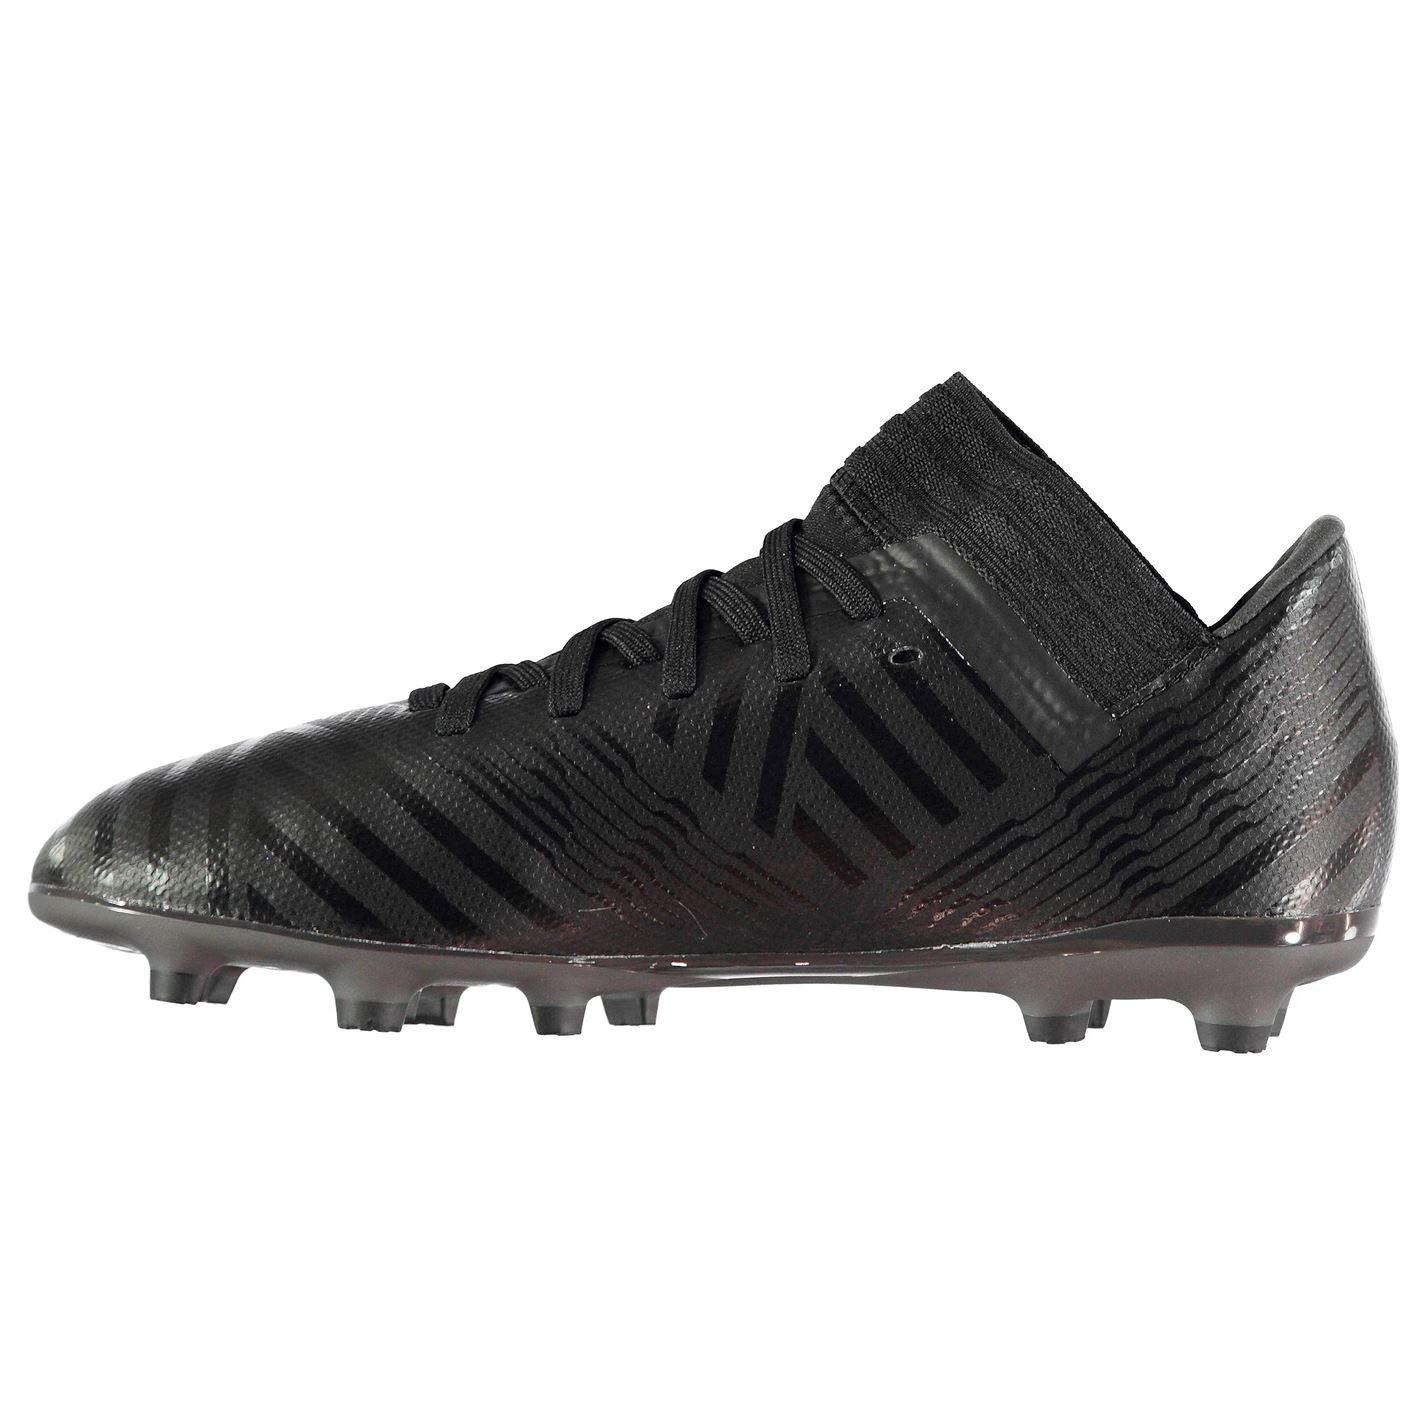 adidas Nemeziz 17.3 FG Firm Ground Kids Soccer Soccer Boot Black Nite Crawler